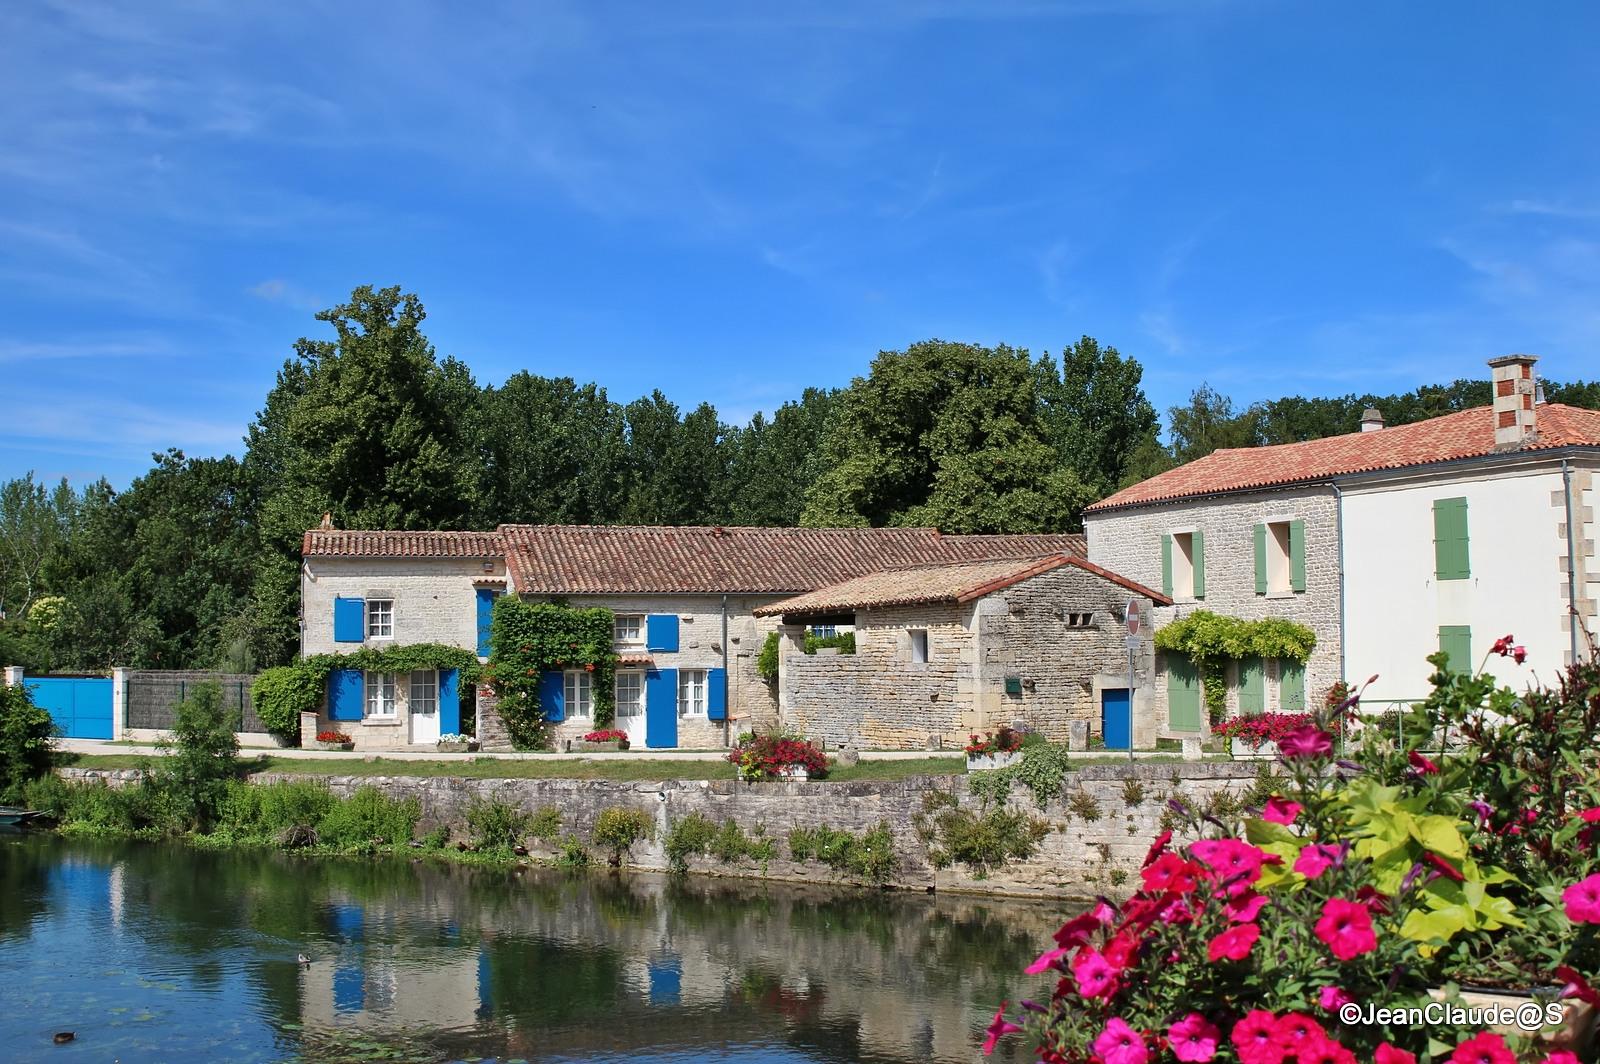 Le Marais Poitevin Img_0540_filtered-529c44c